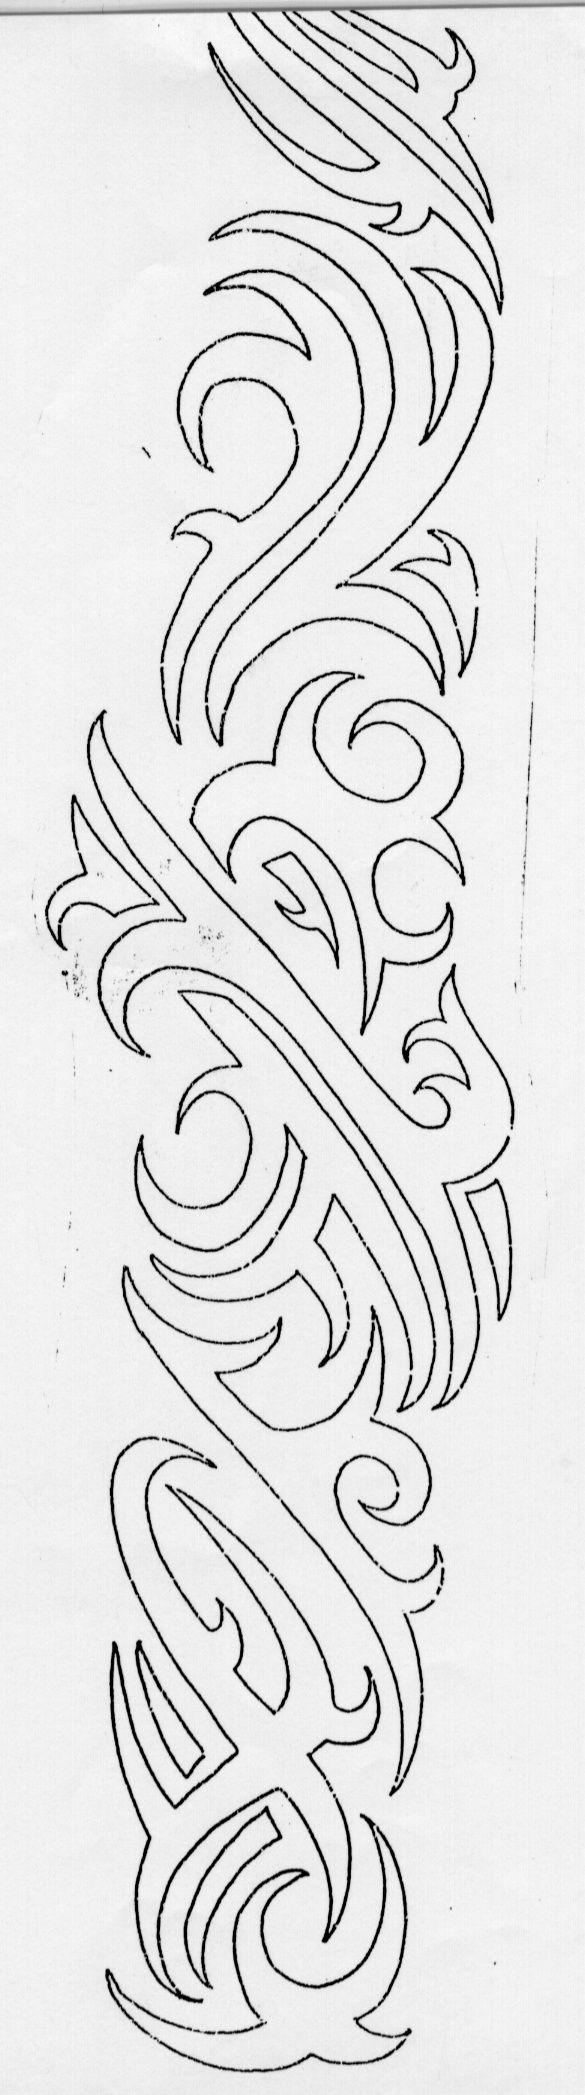 Tribal tattoo outlinesforearm tattoo designs writingtattoos ...